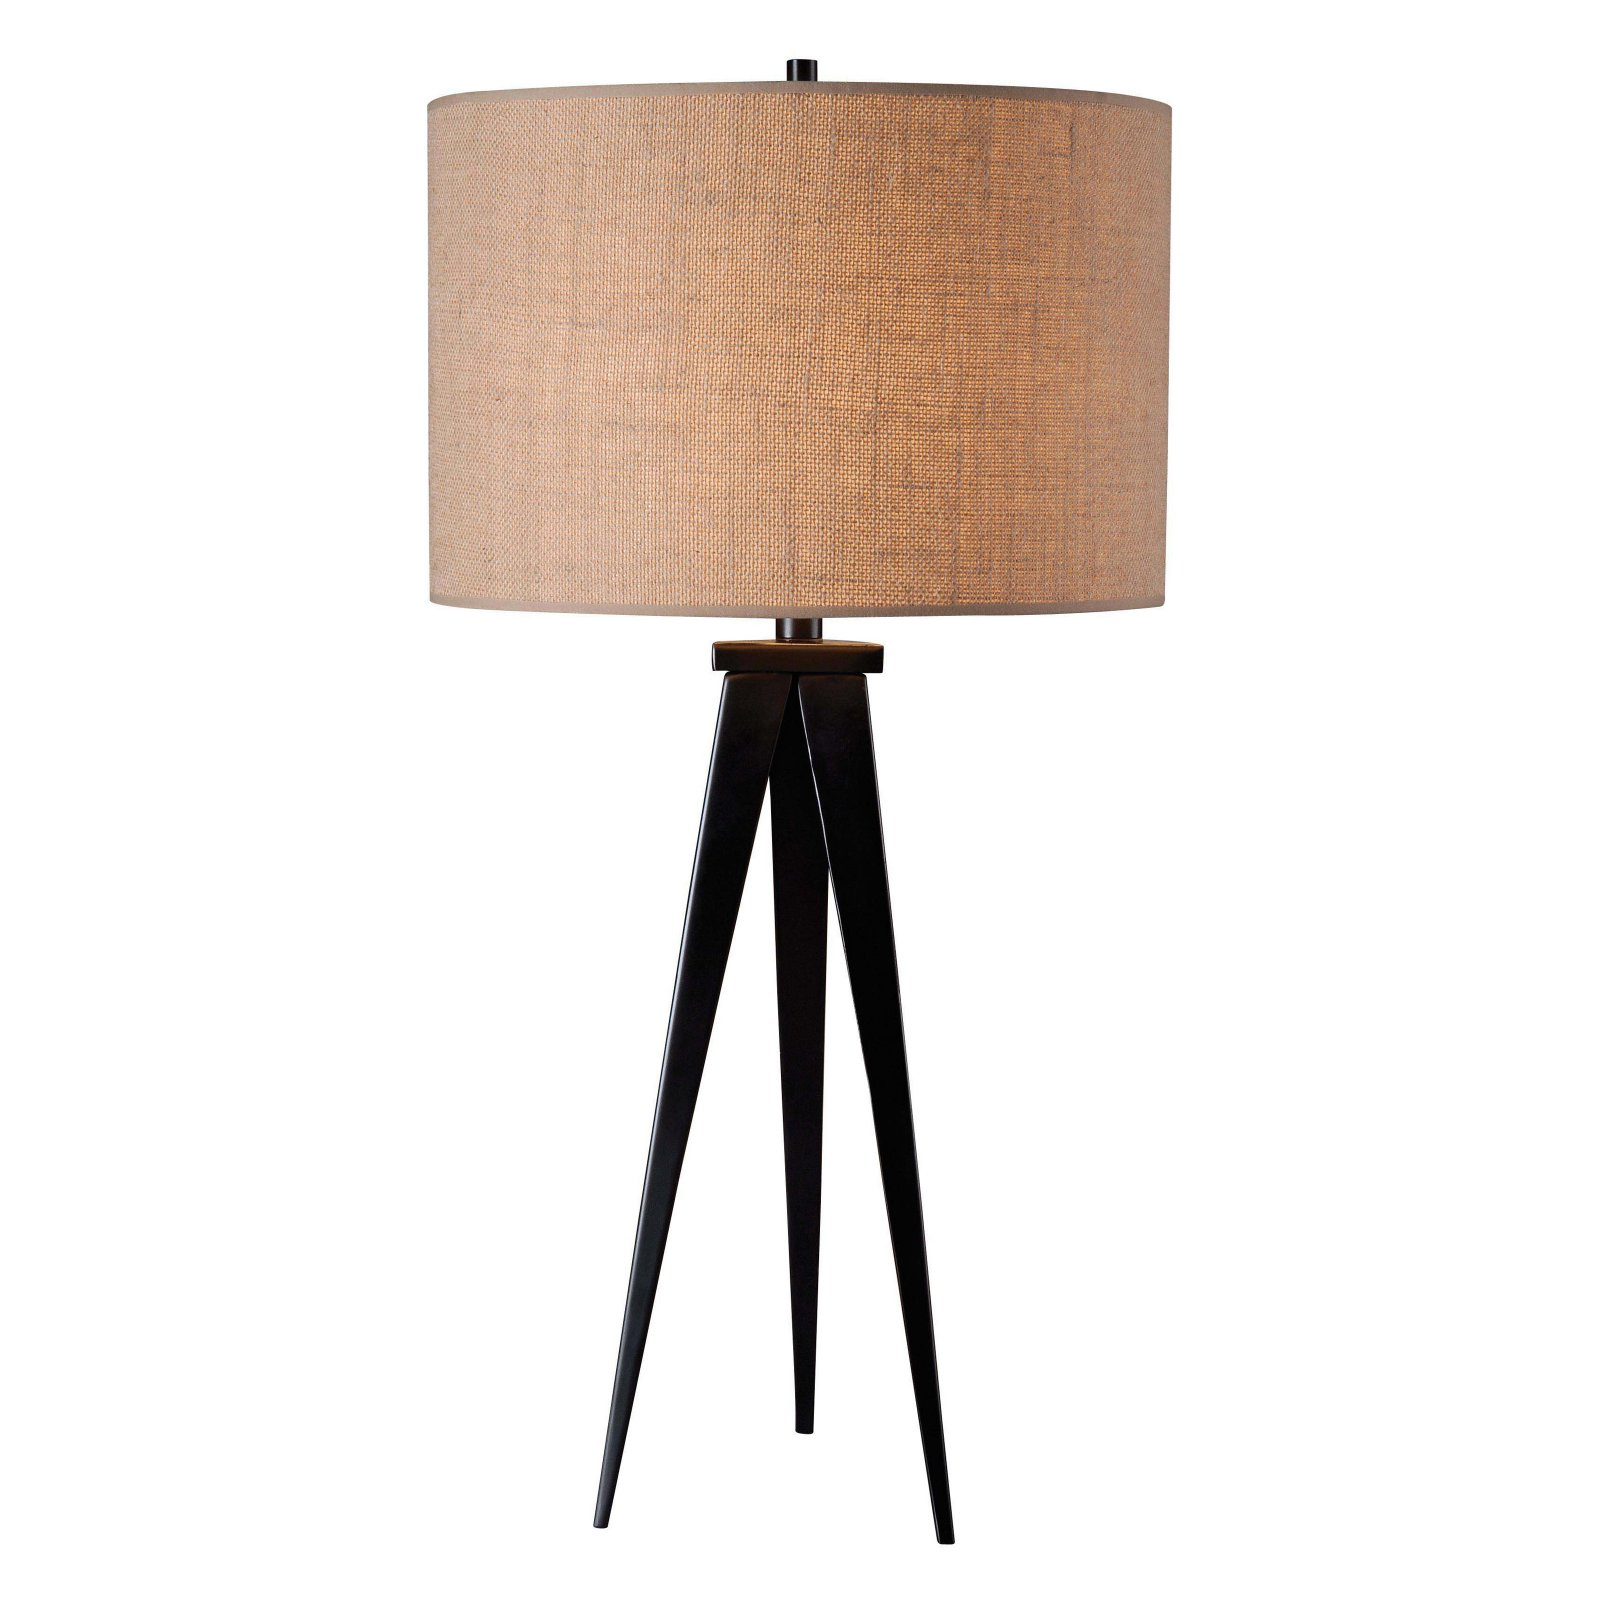 Kenroy Home Table Lamp - Bronze